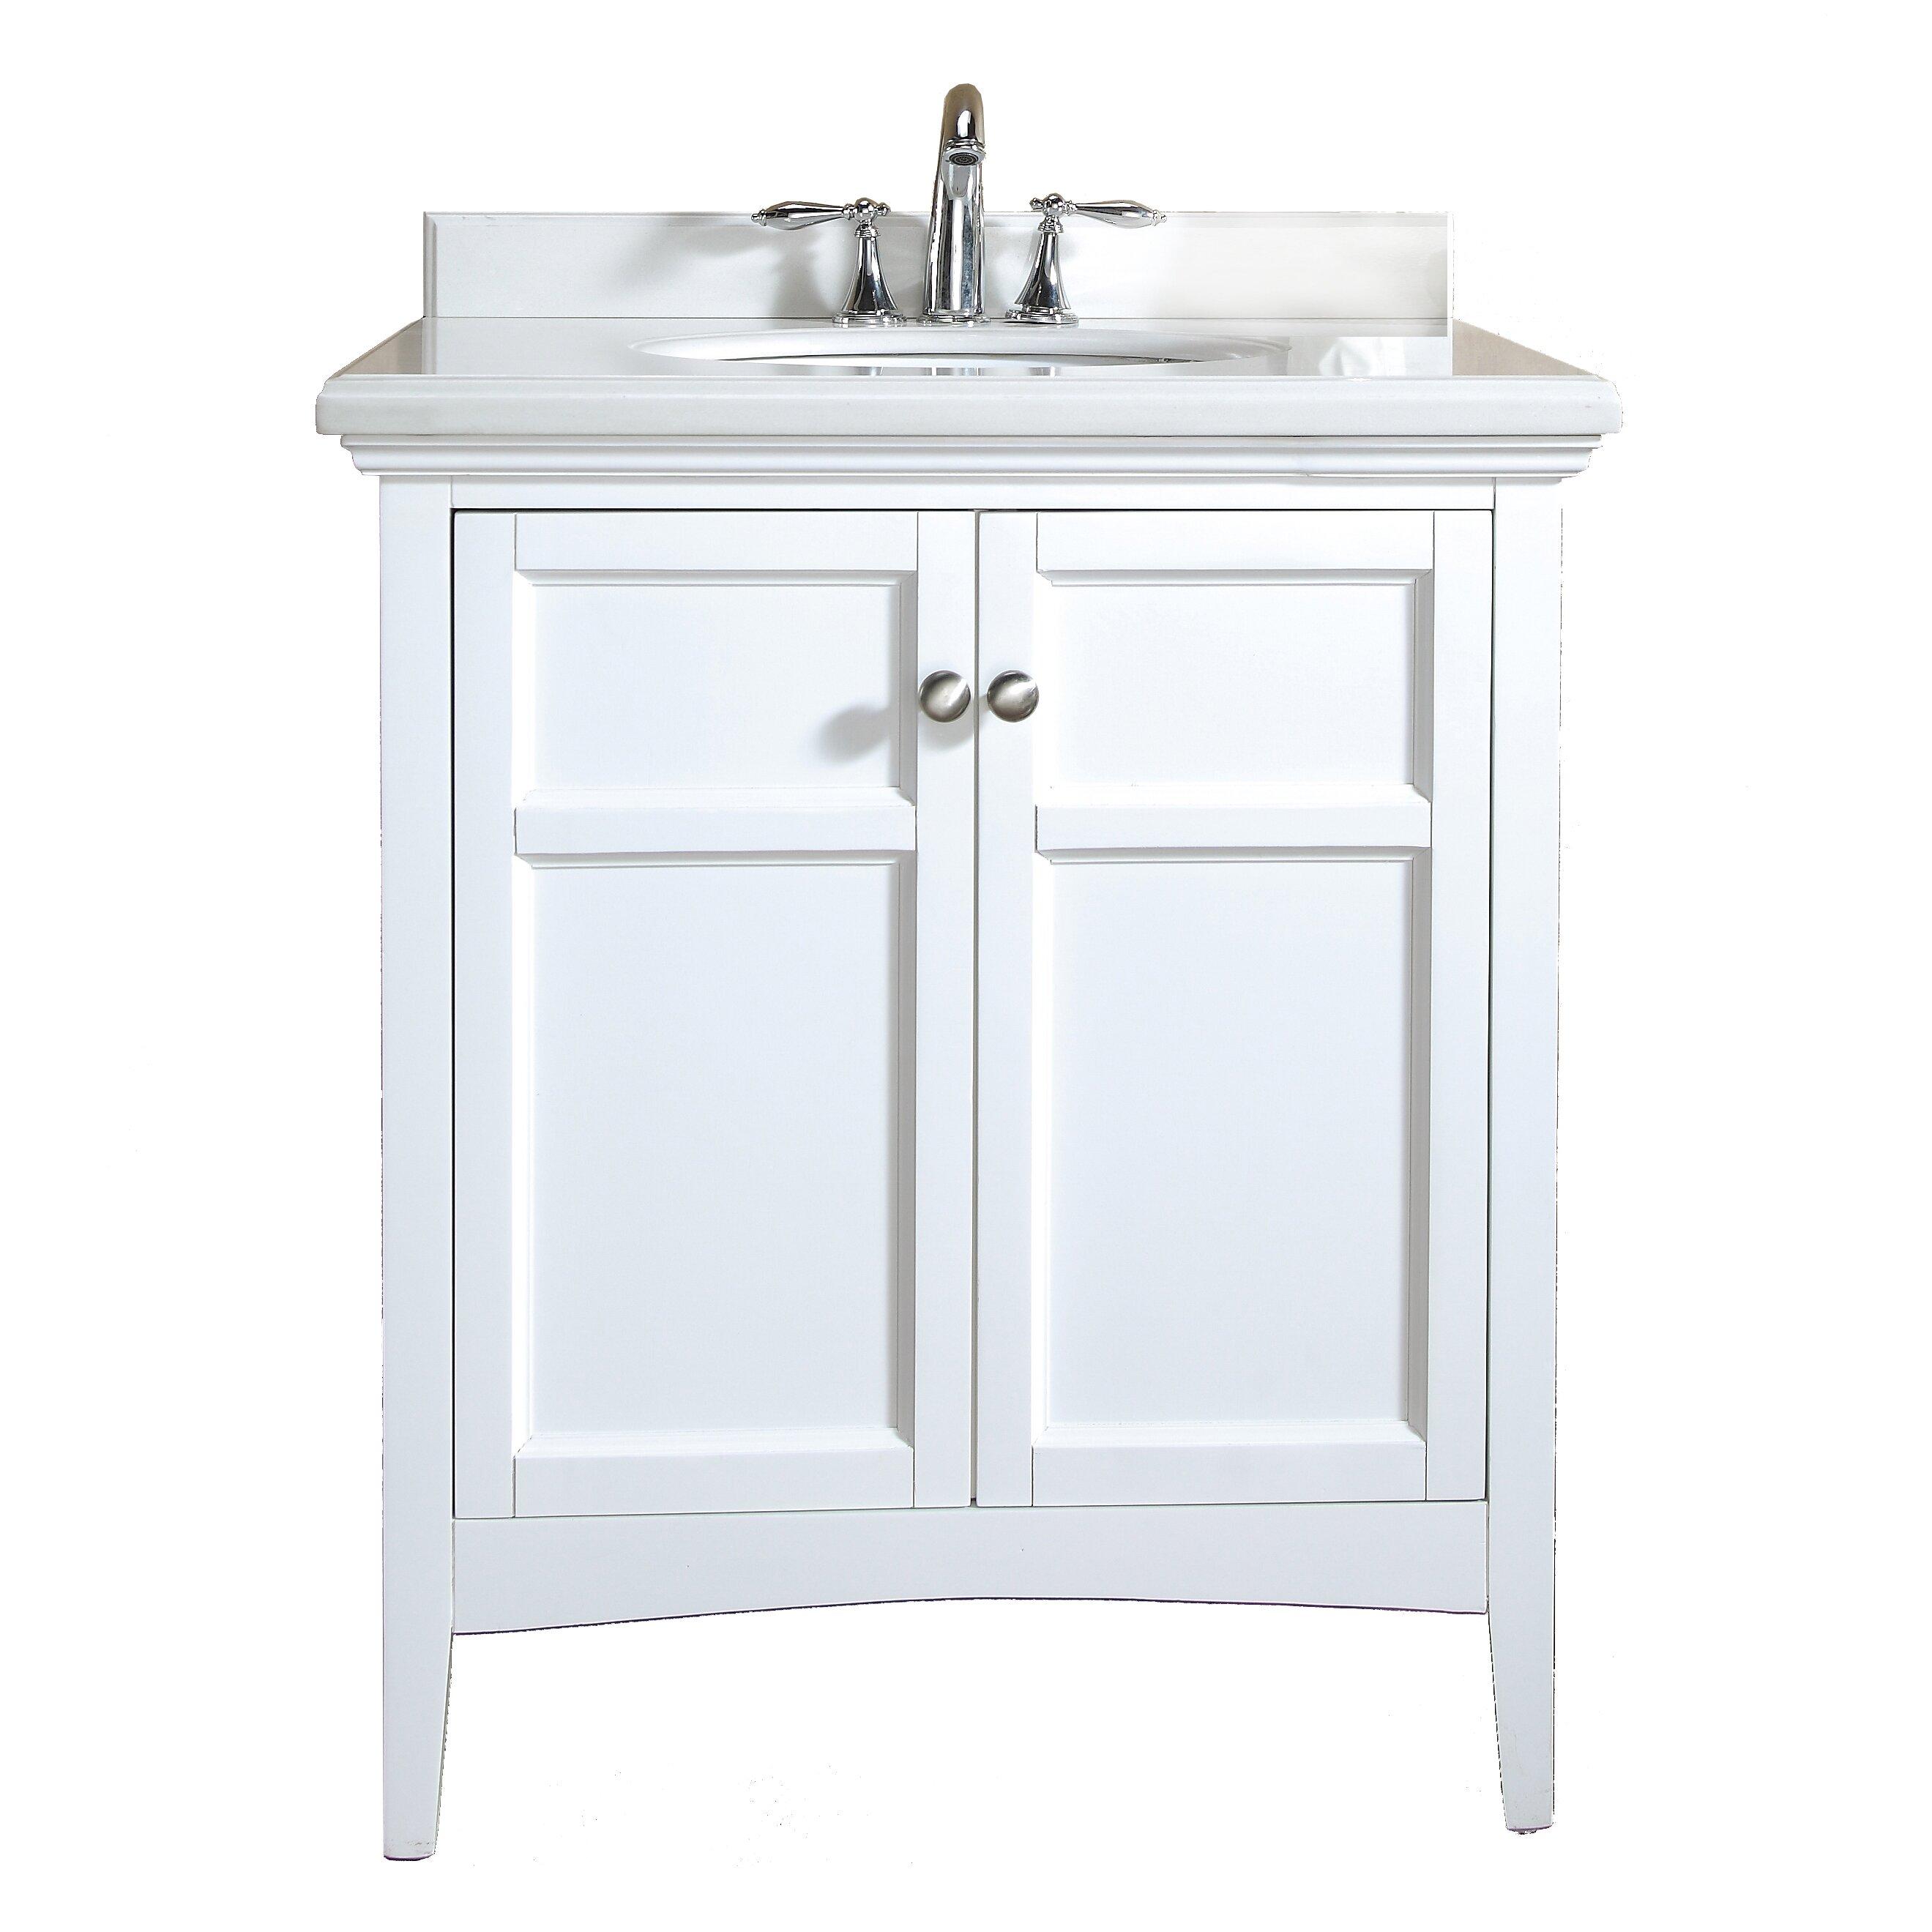 Ove decors campo 30 single bathroom vanity set reviews for Decor vanity